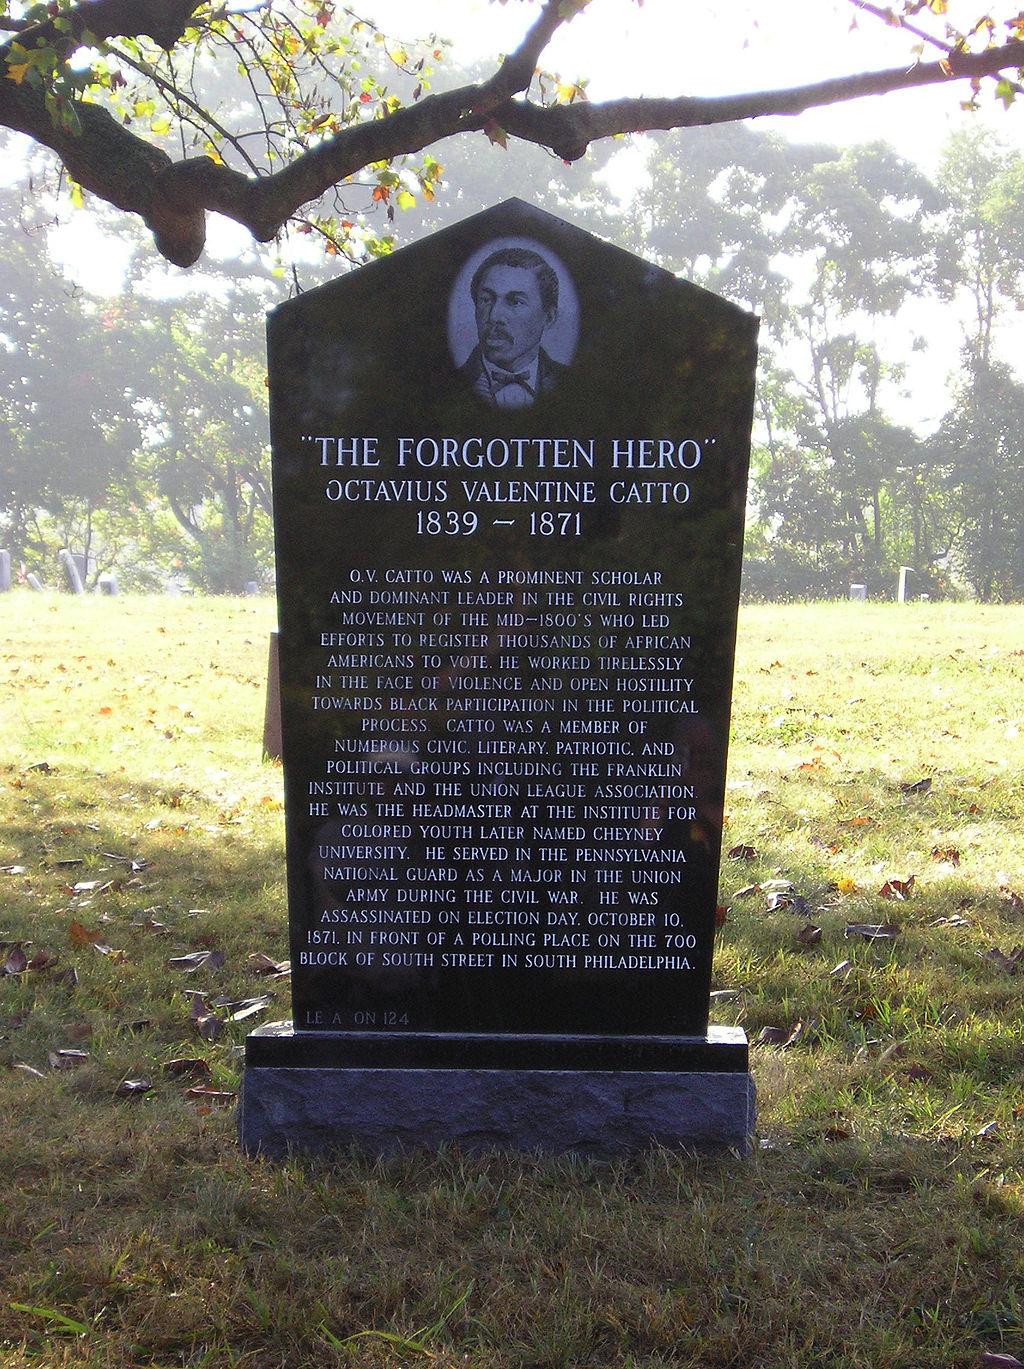 Murder of Octavius Catto | Encyclopedia of Greater Philadelphia